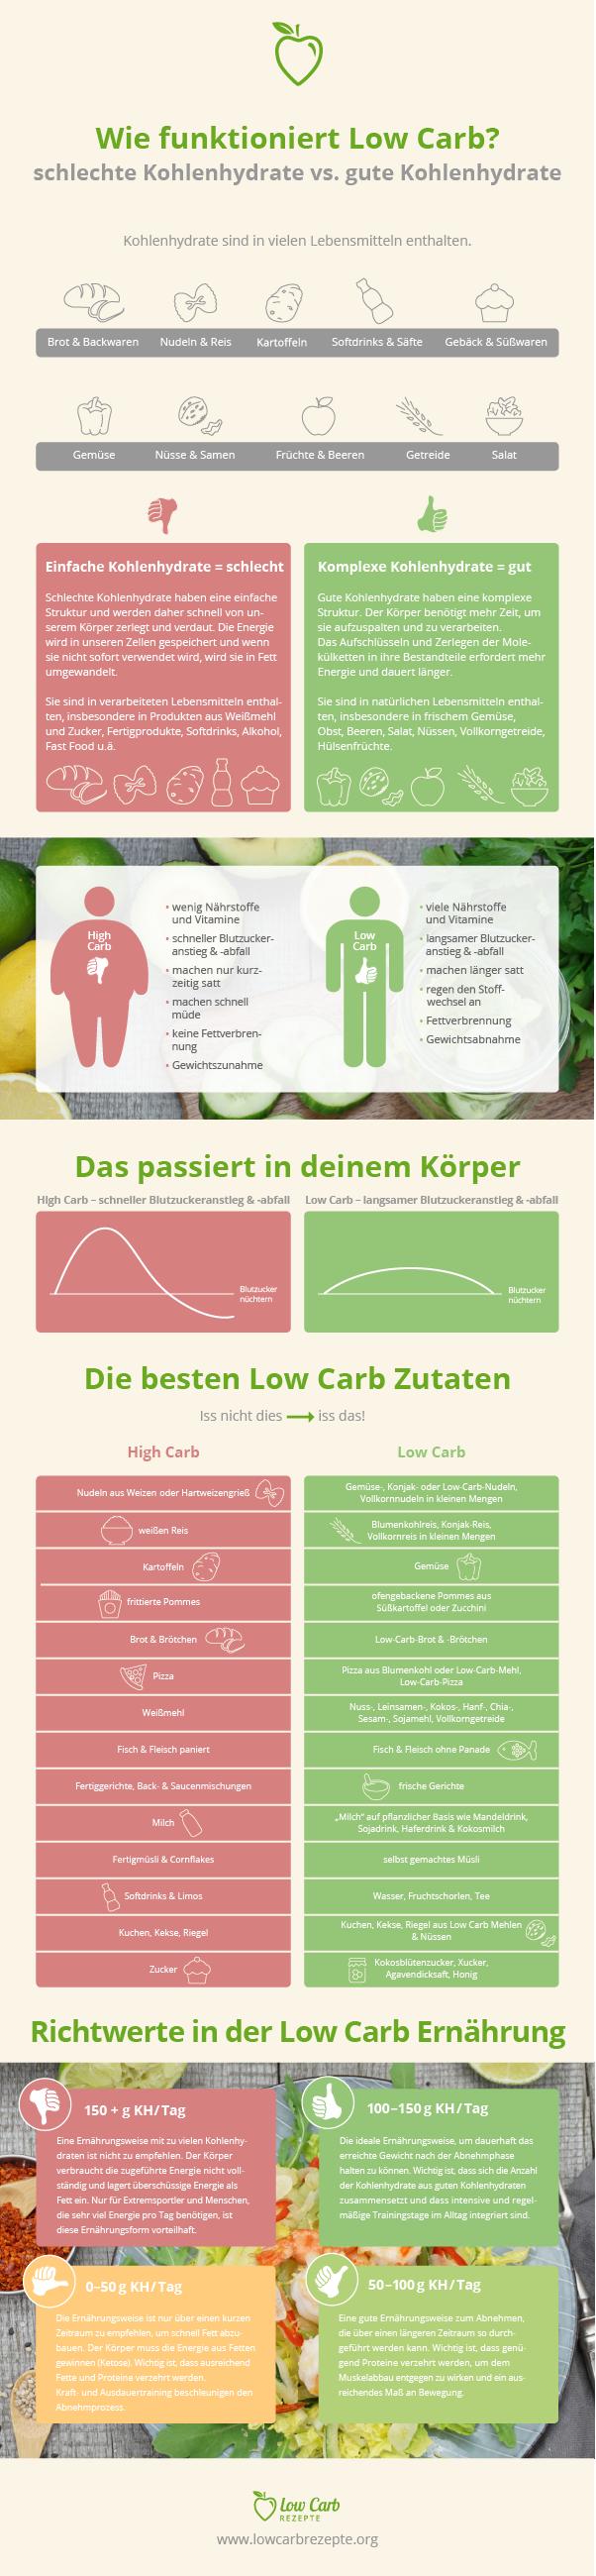 Low Carb Diät funktioniert